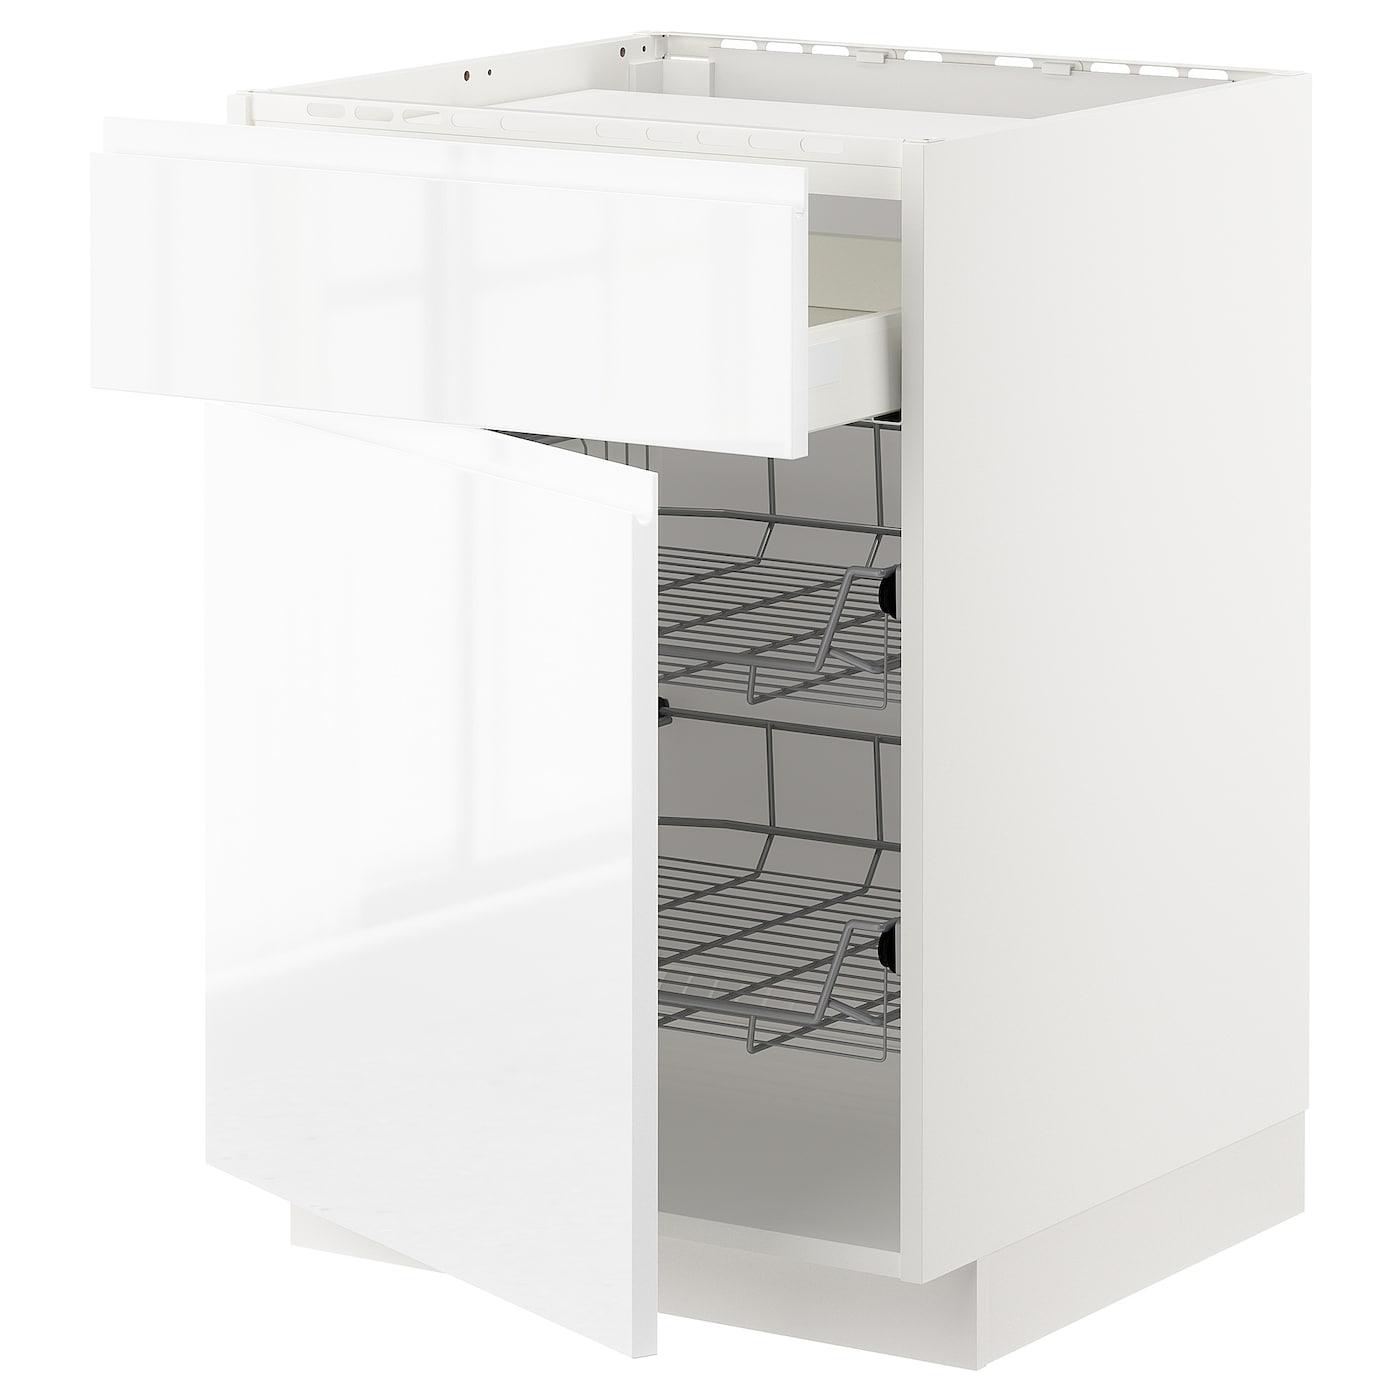 Metod maximera lt bas tbl cuiss tiroir 2corb fil blanc for Meuble 60x60